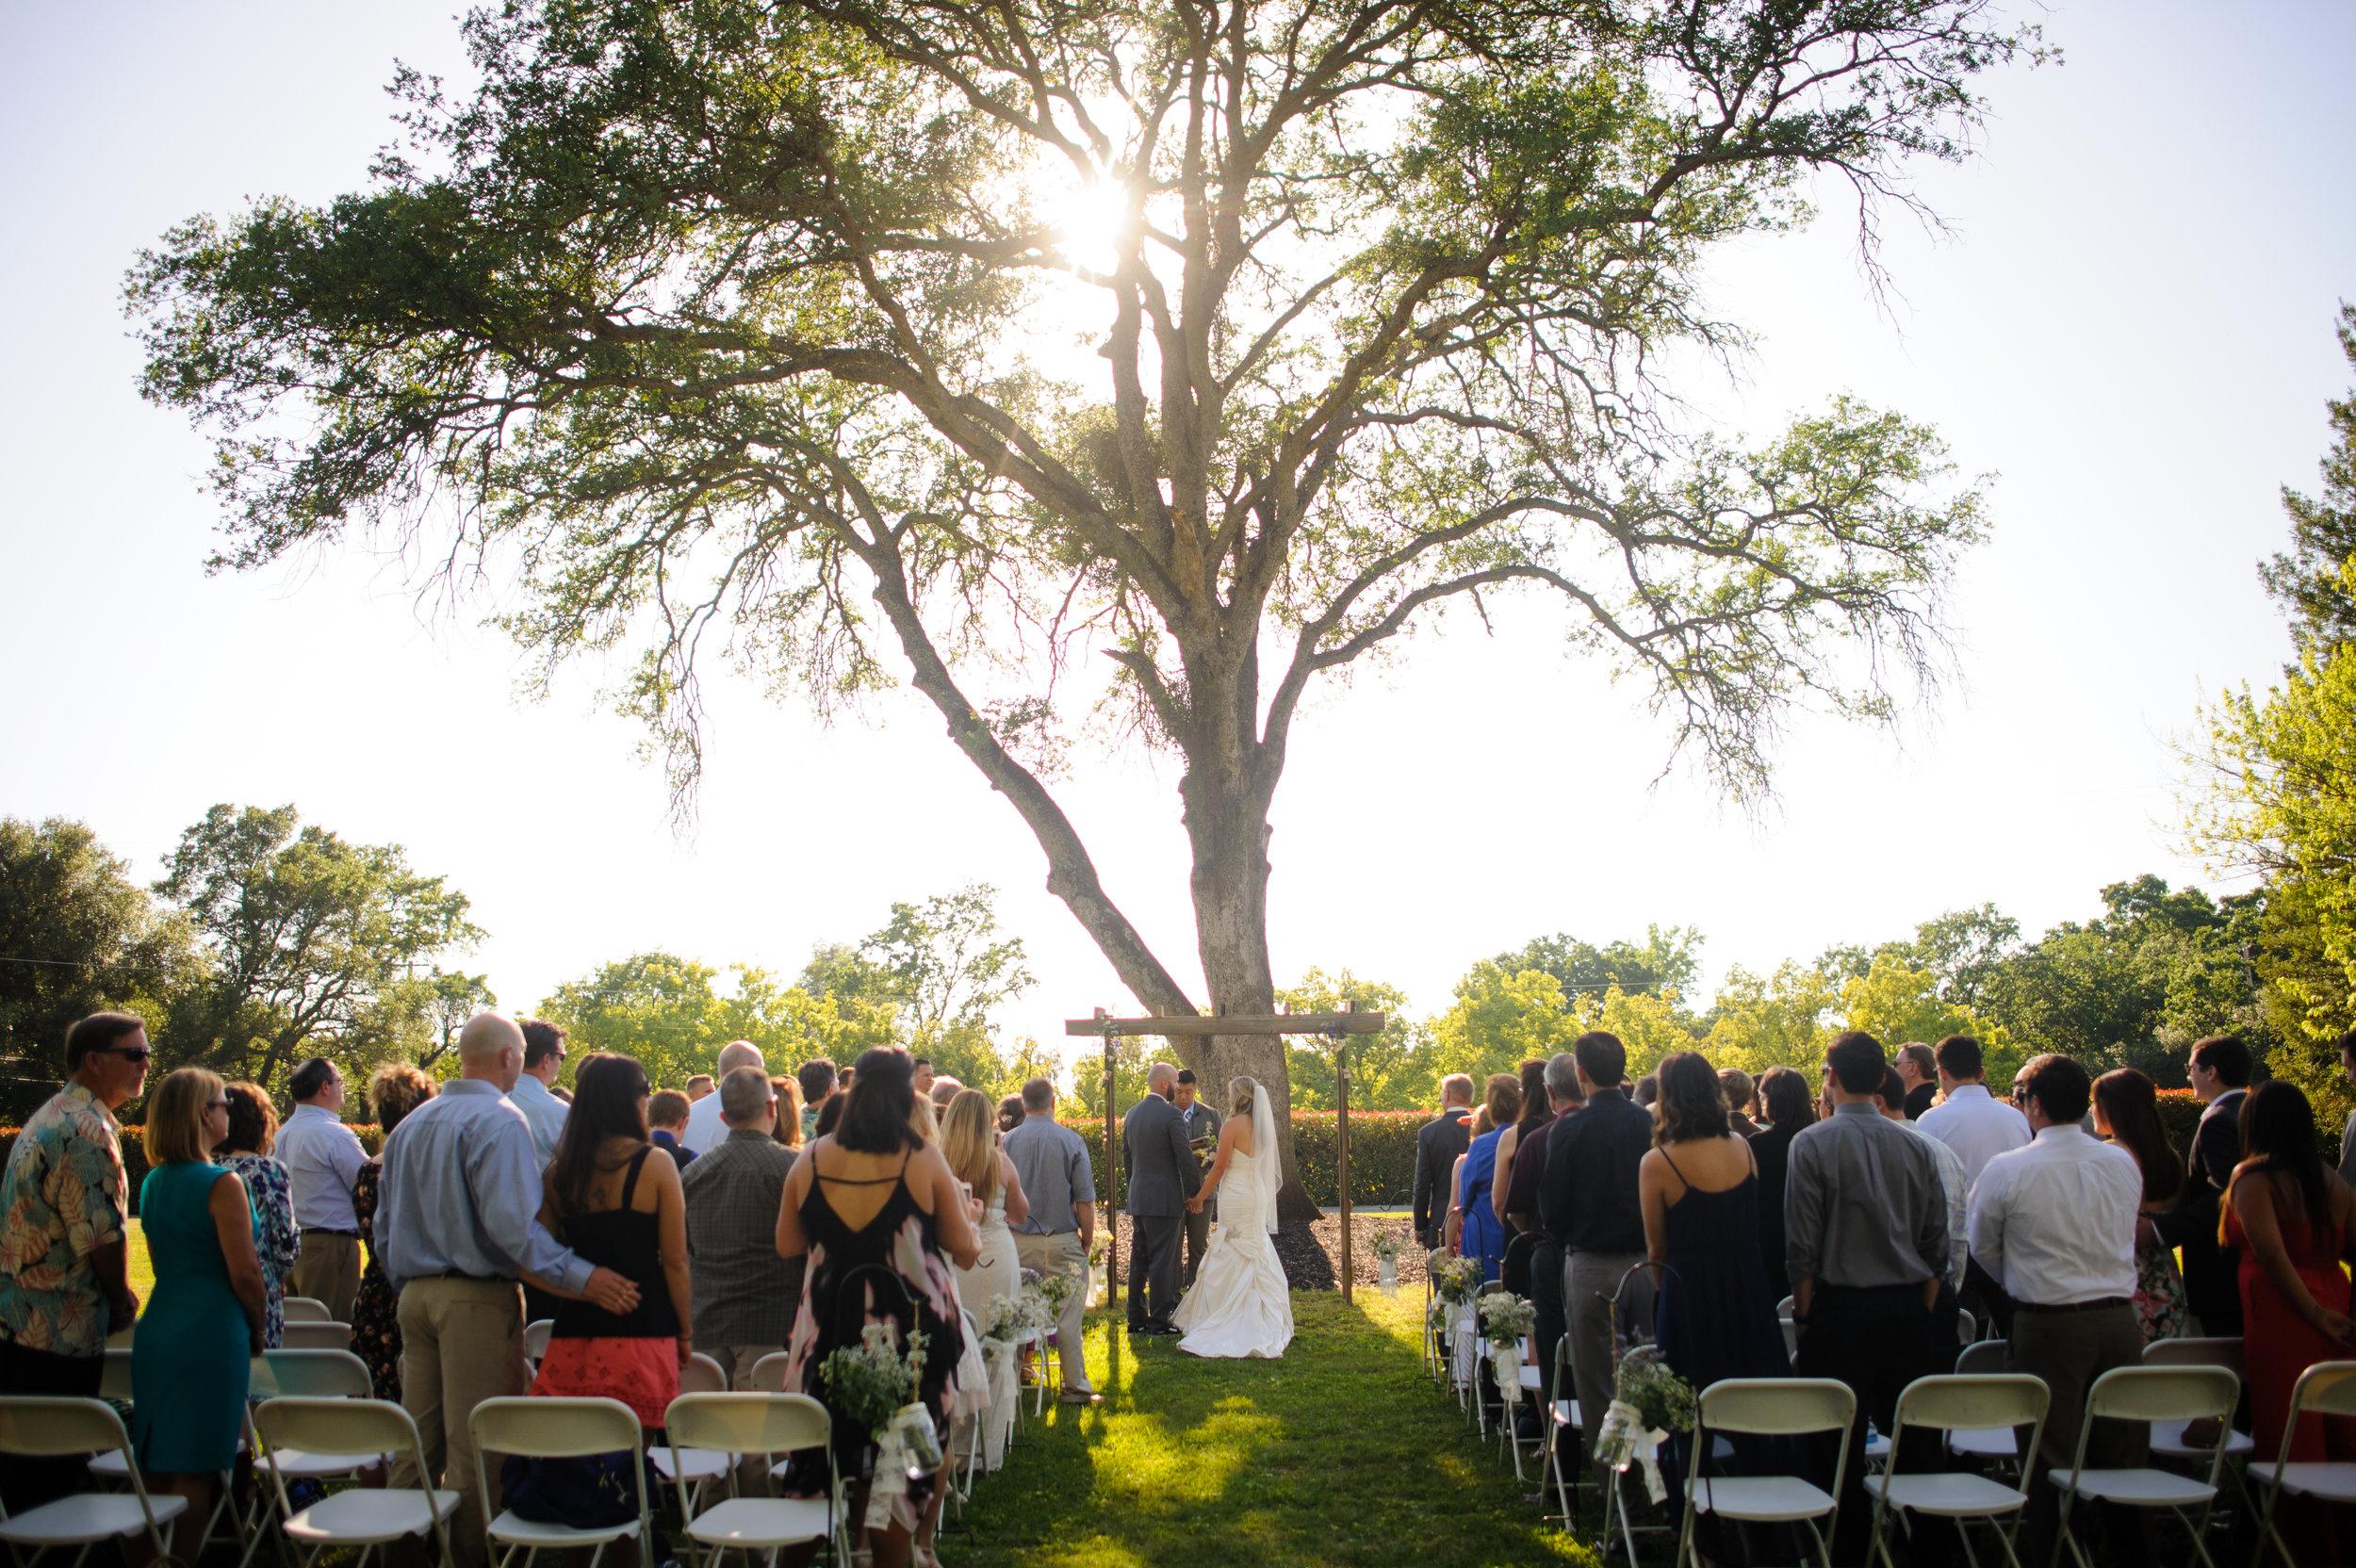 lindsey-alex-018-backyard-sacramento-wedding-photographer-katherine-nicole-photography.JPG